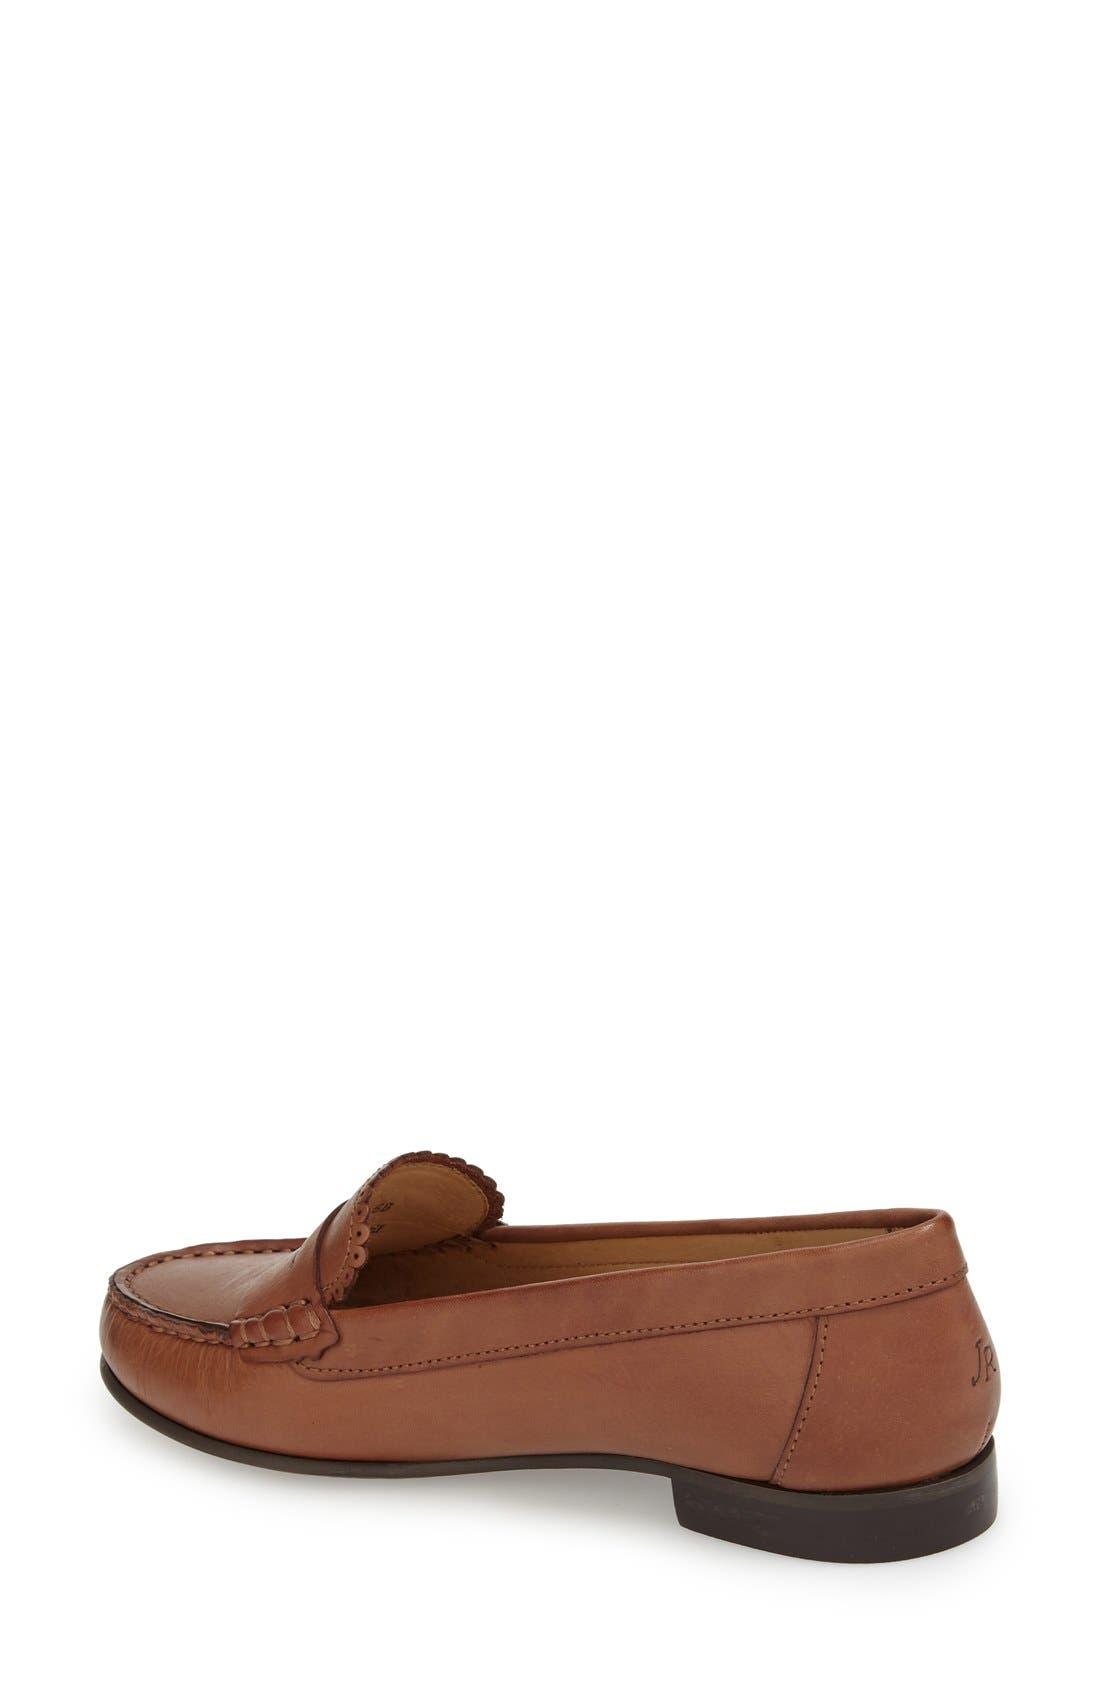 'Quinn' Leather Loafer,                             Alternate thumbnail 10, color,